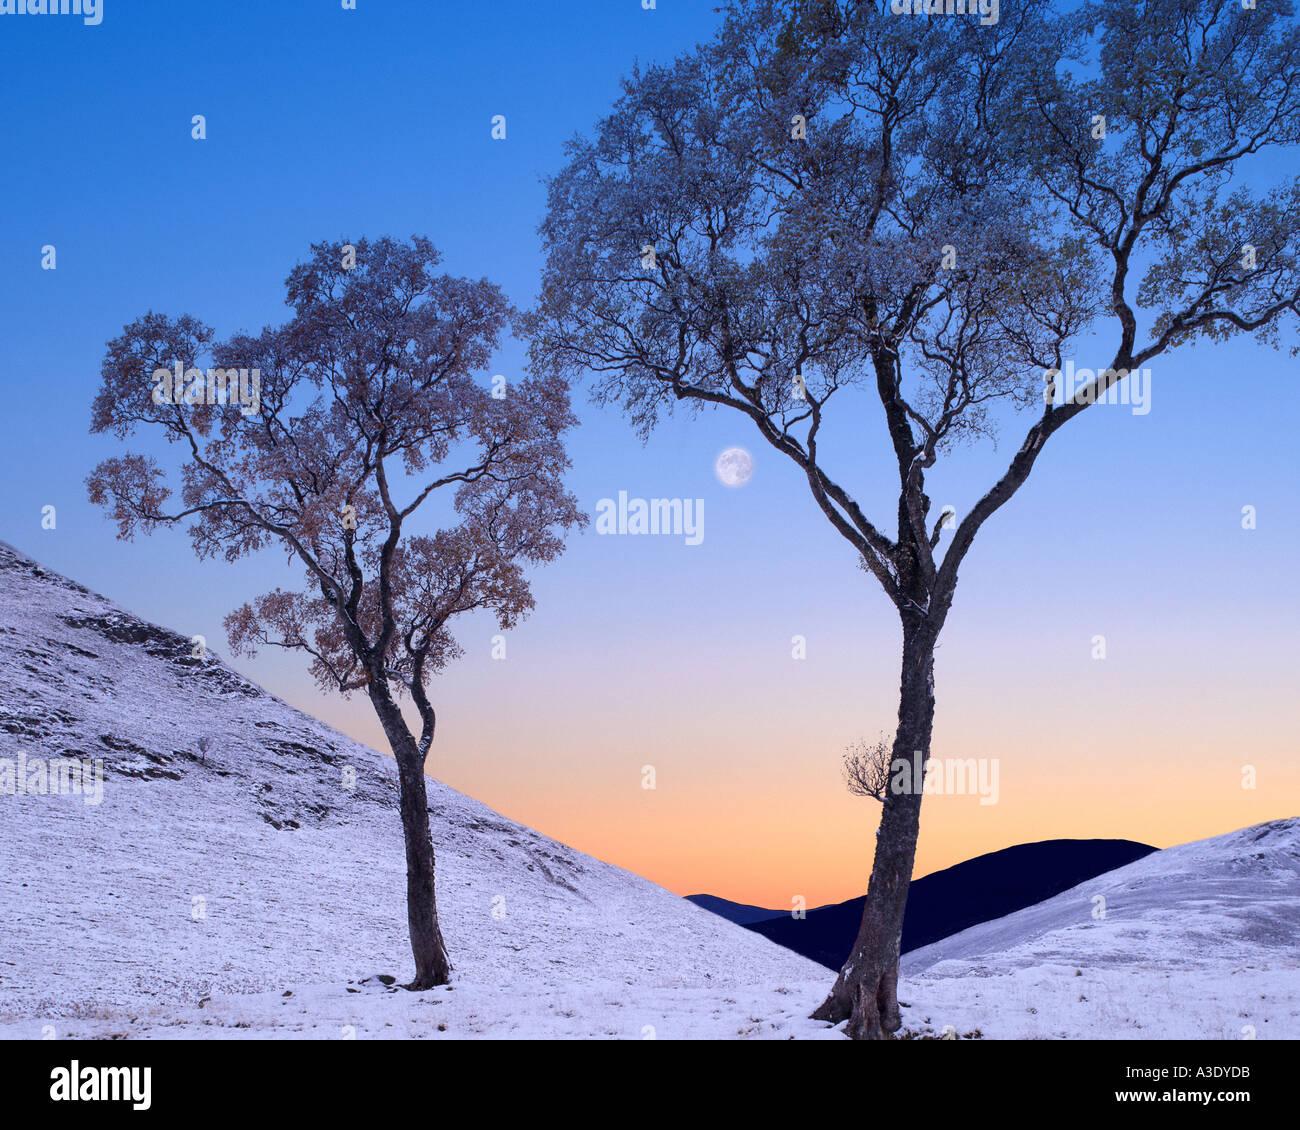 GB - SCOTLAND: Wintertime in Glen Lochsie - Stock Image